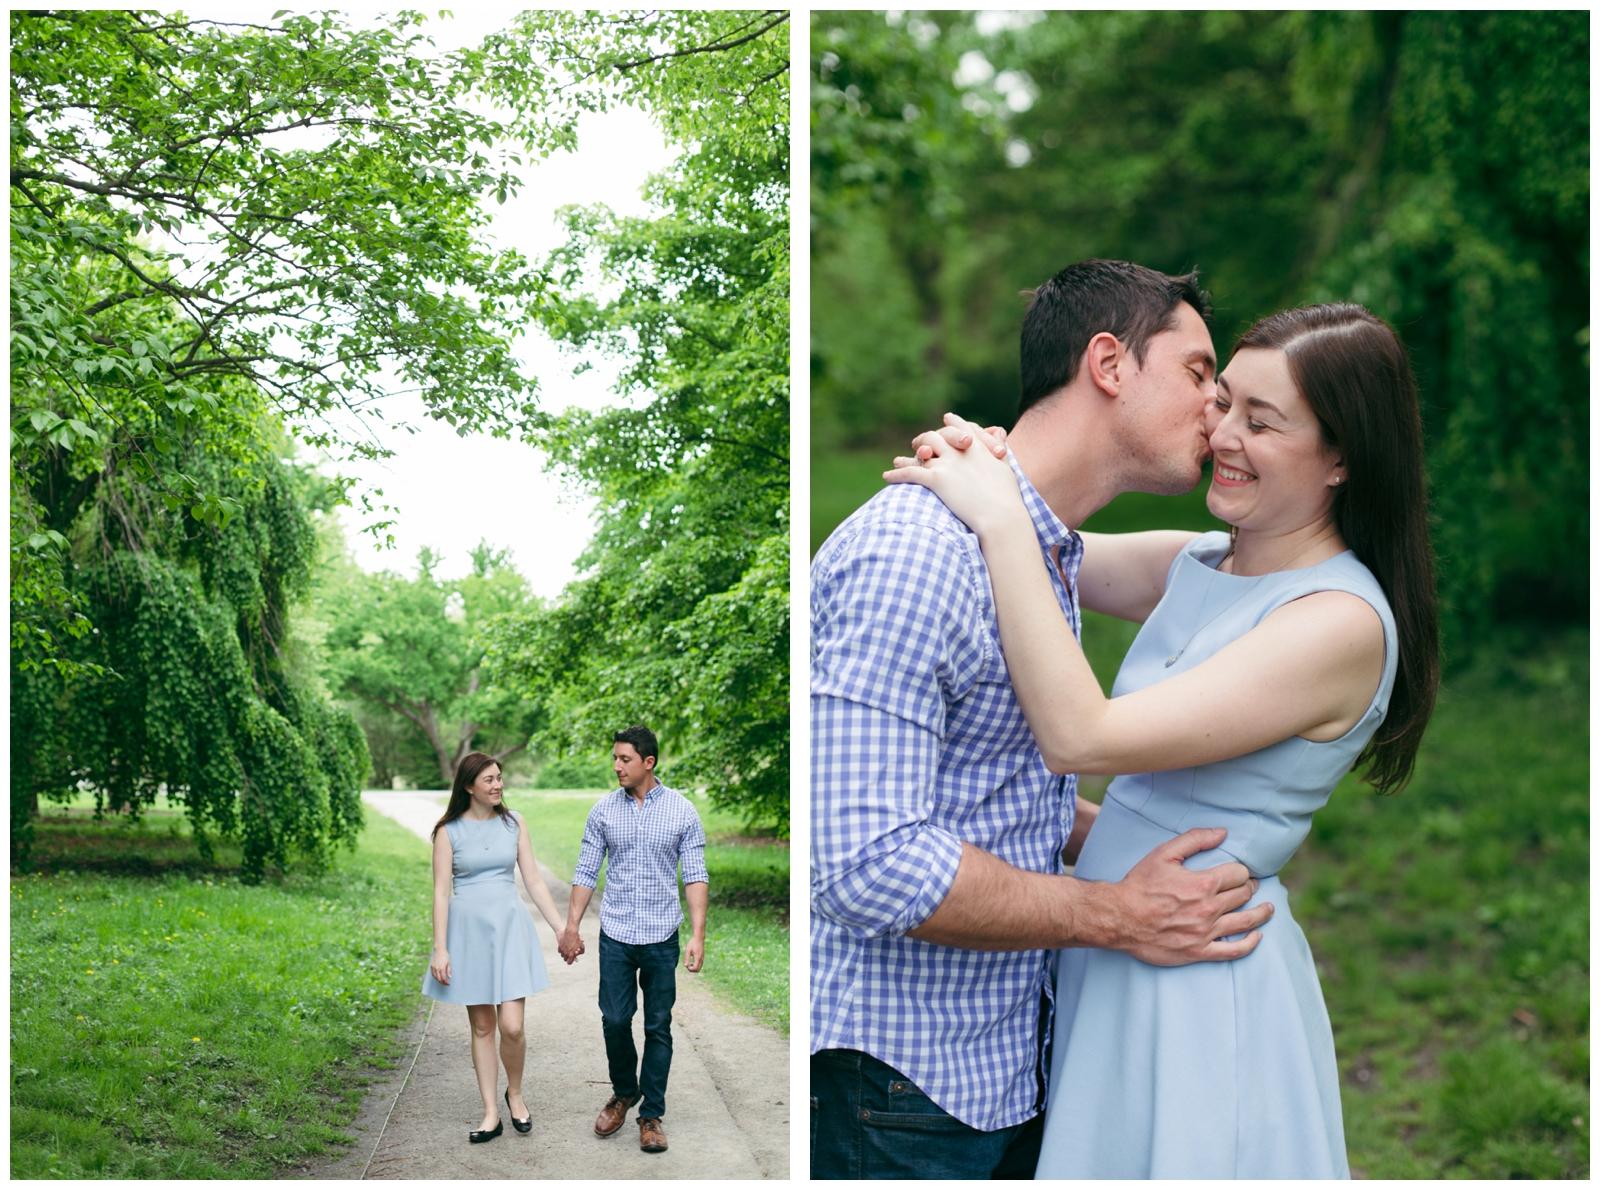 Arnold-Arboretum-Engagement-Boston-Wedding-Photographer-Bailey-Q-Photo-003.jpg